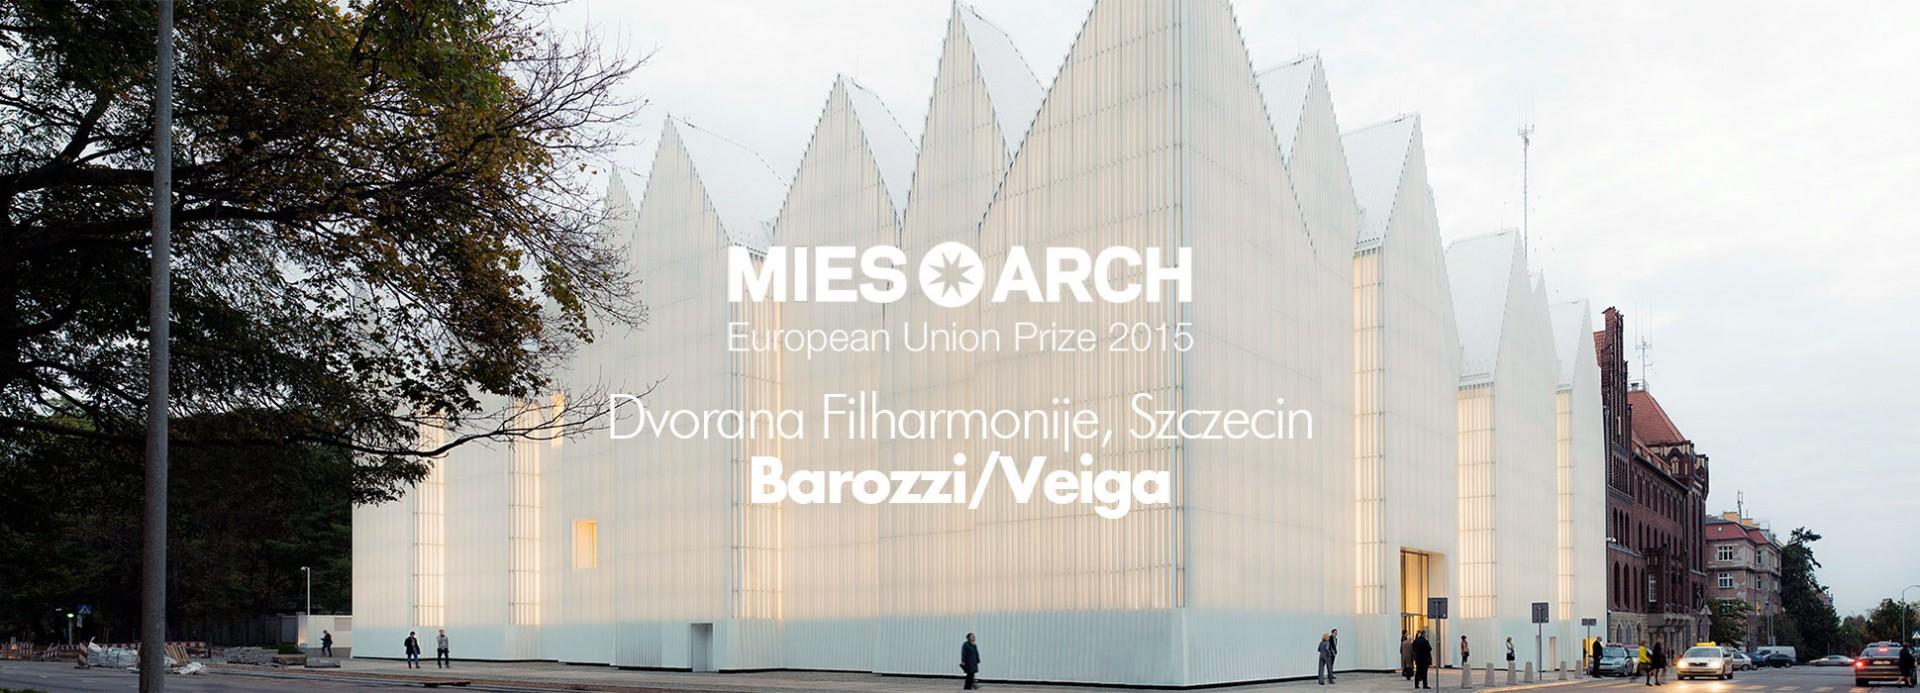 Mies van der Rohe Award 2015: Barozzi/Veiga – Dvorana Filharmonije, Šćećin